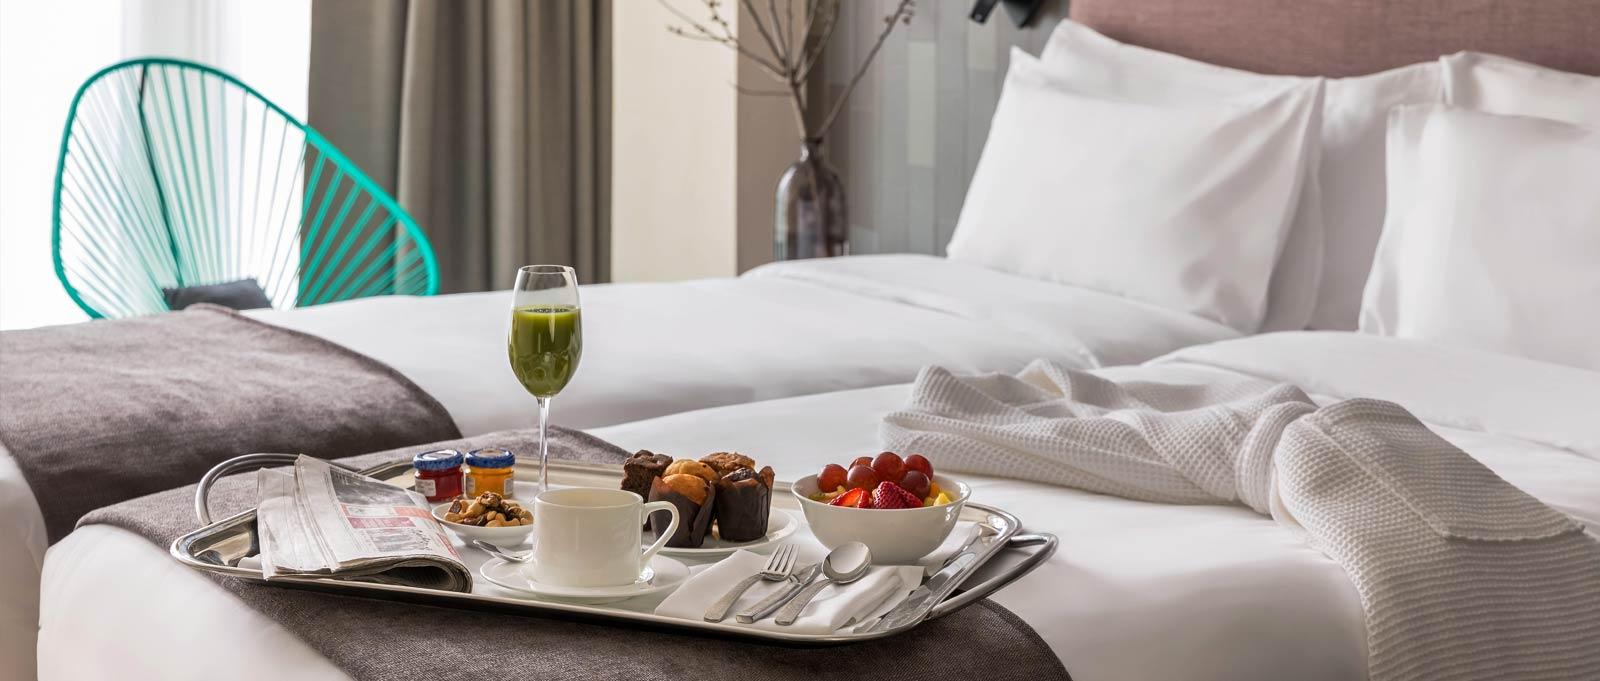 hotel-ohla-eixample-desayunos-xerta-restaurant